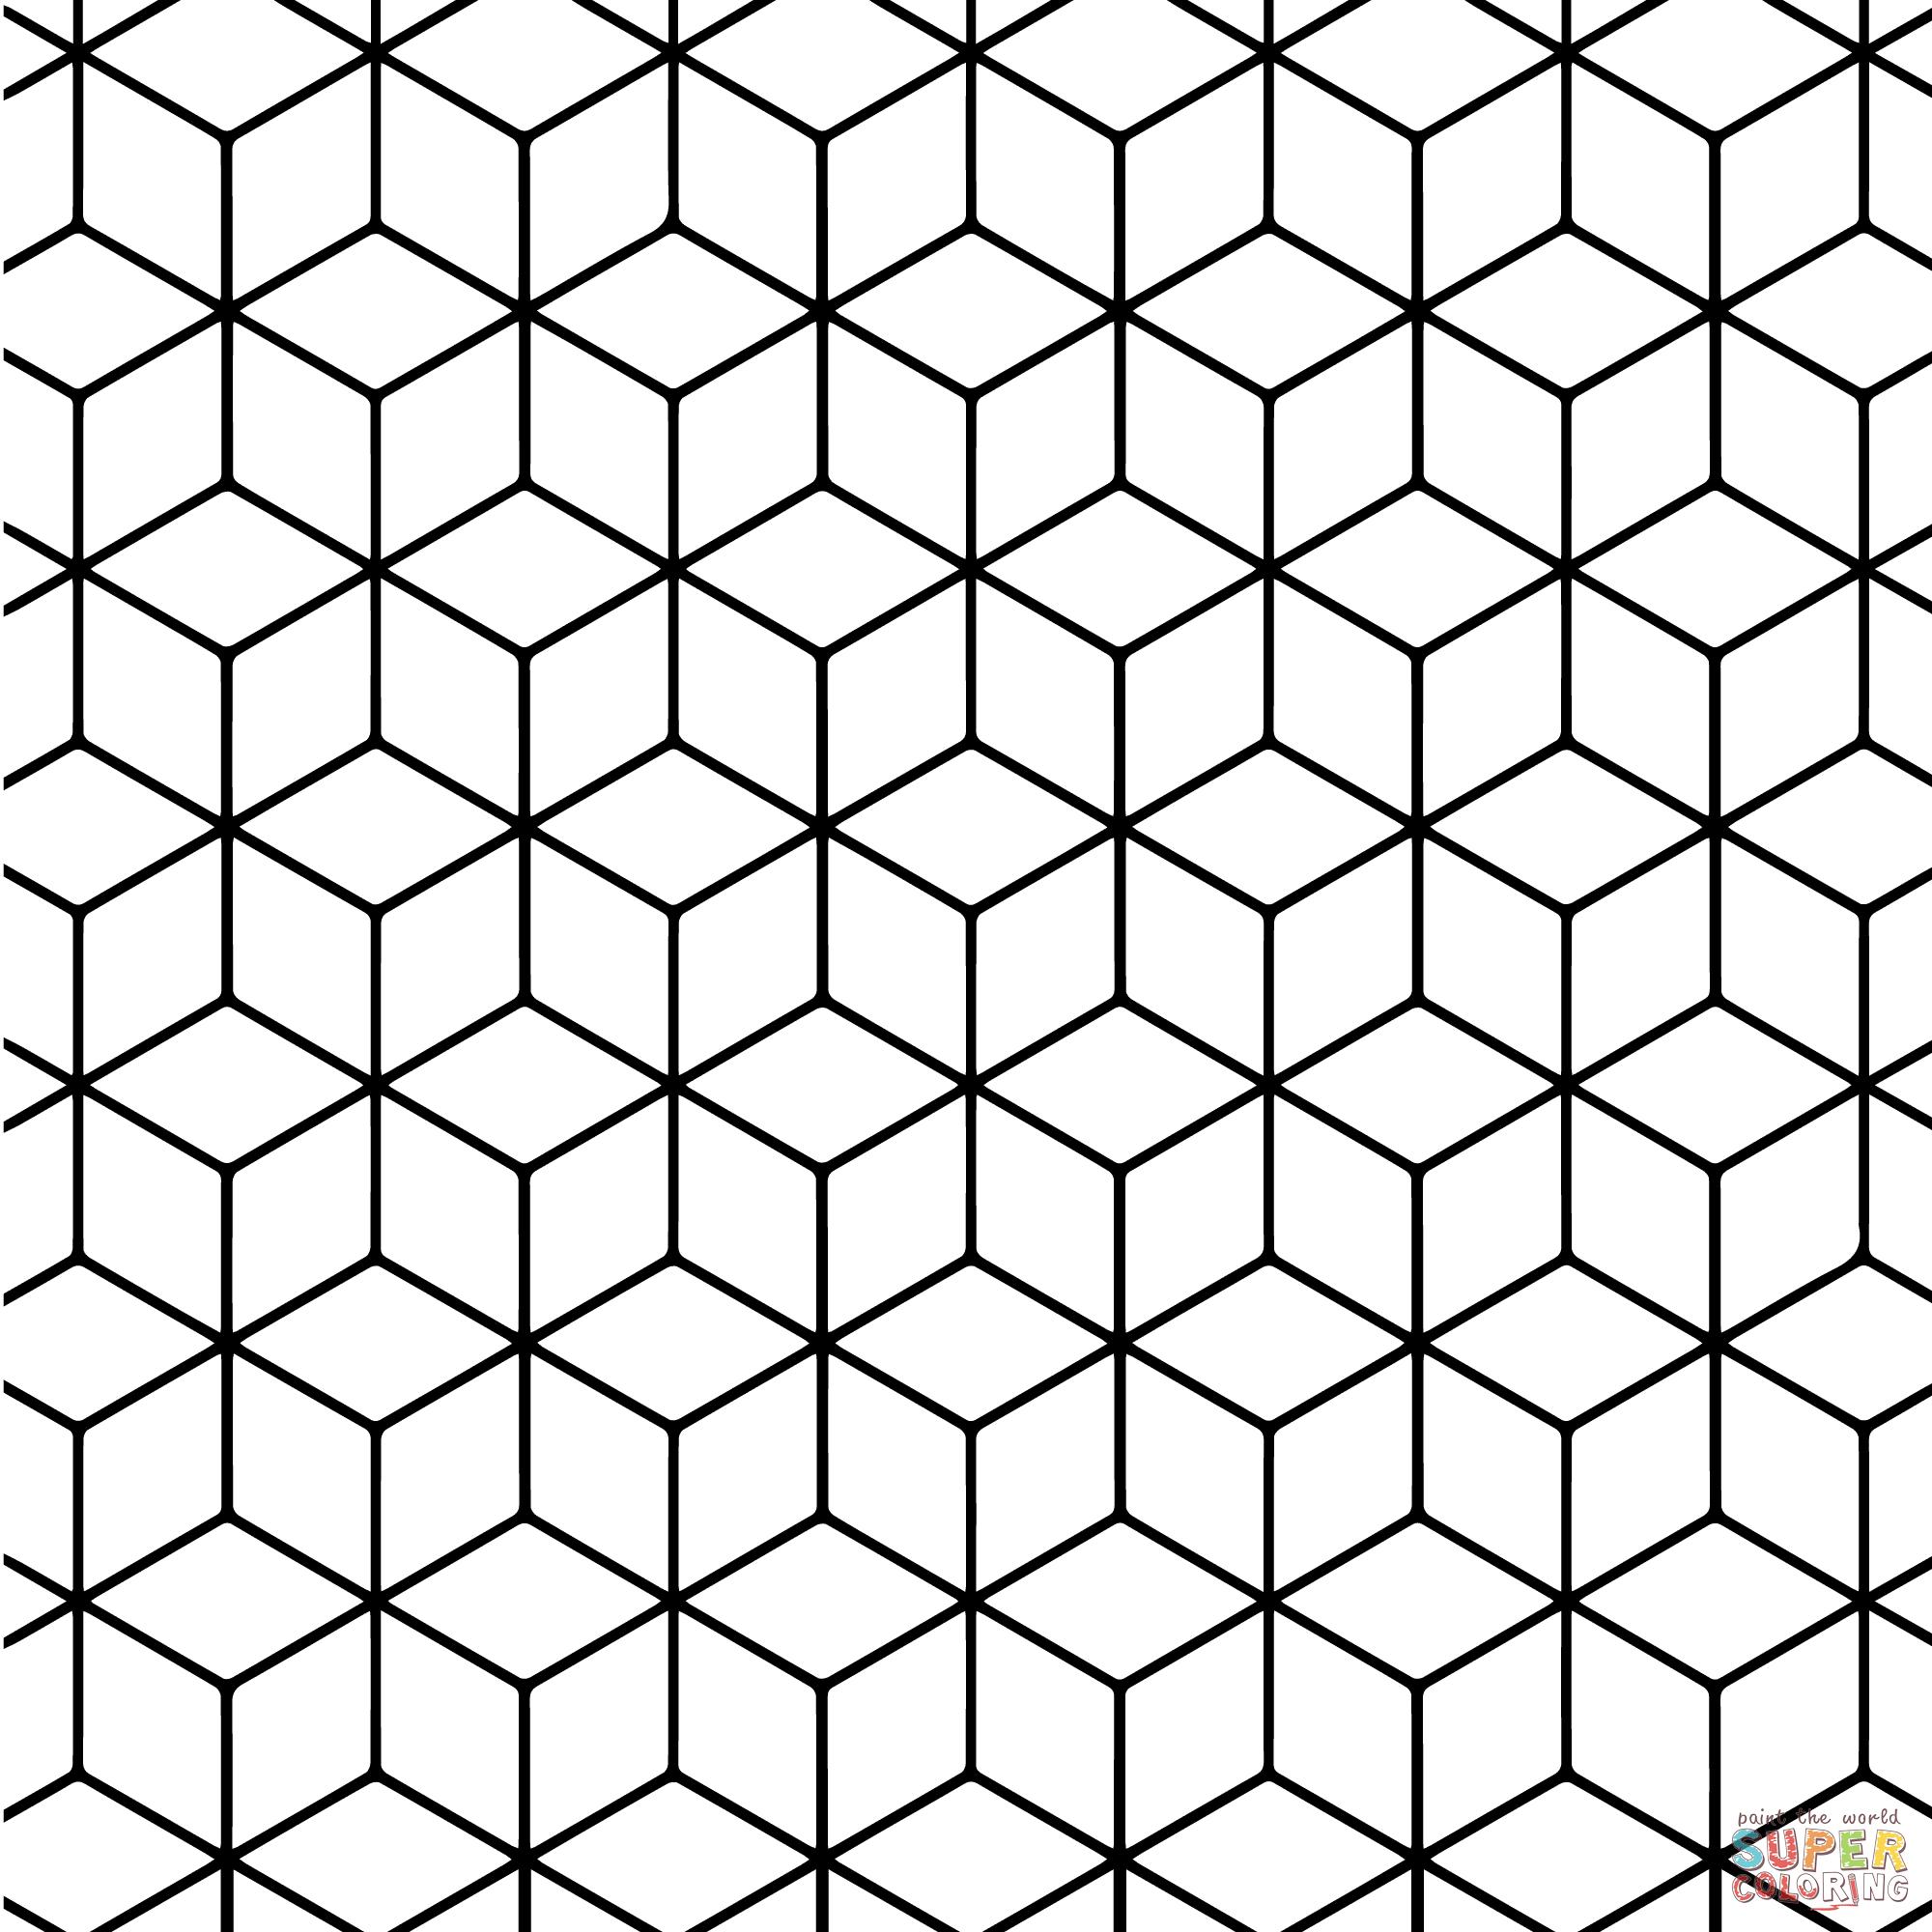 Geometric Tessellation with Rhombus